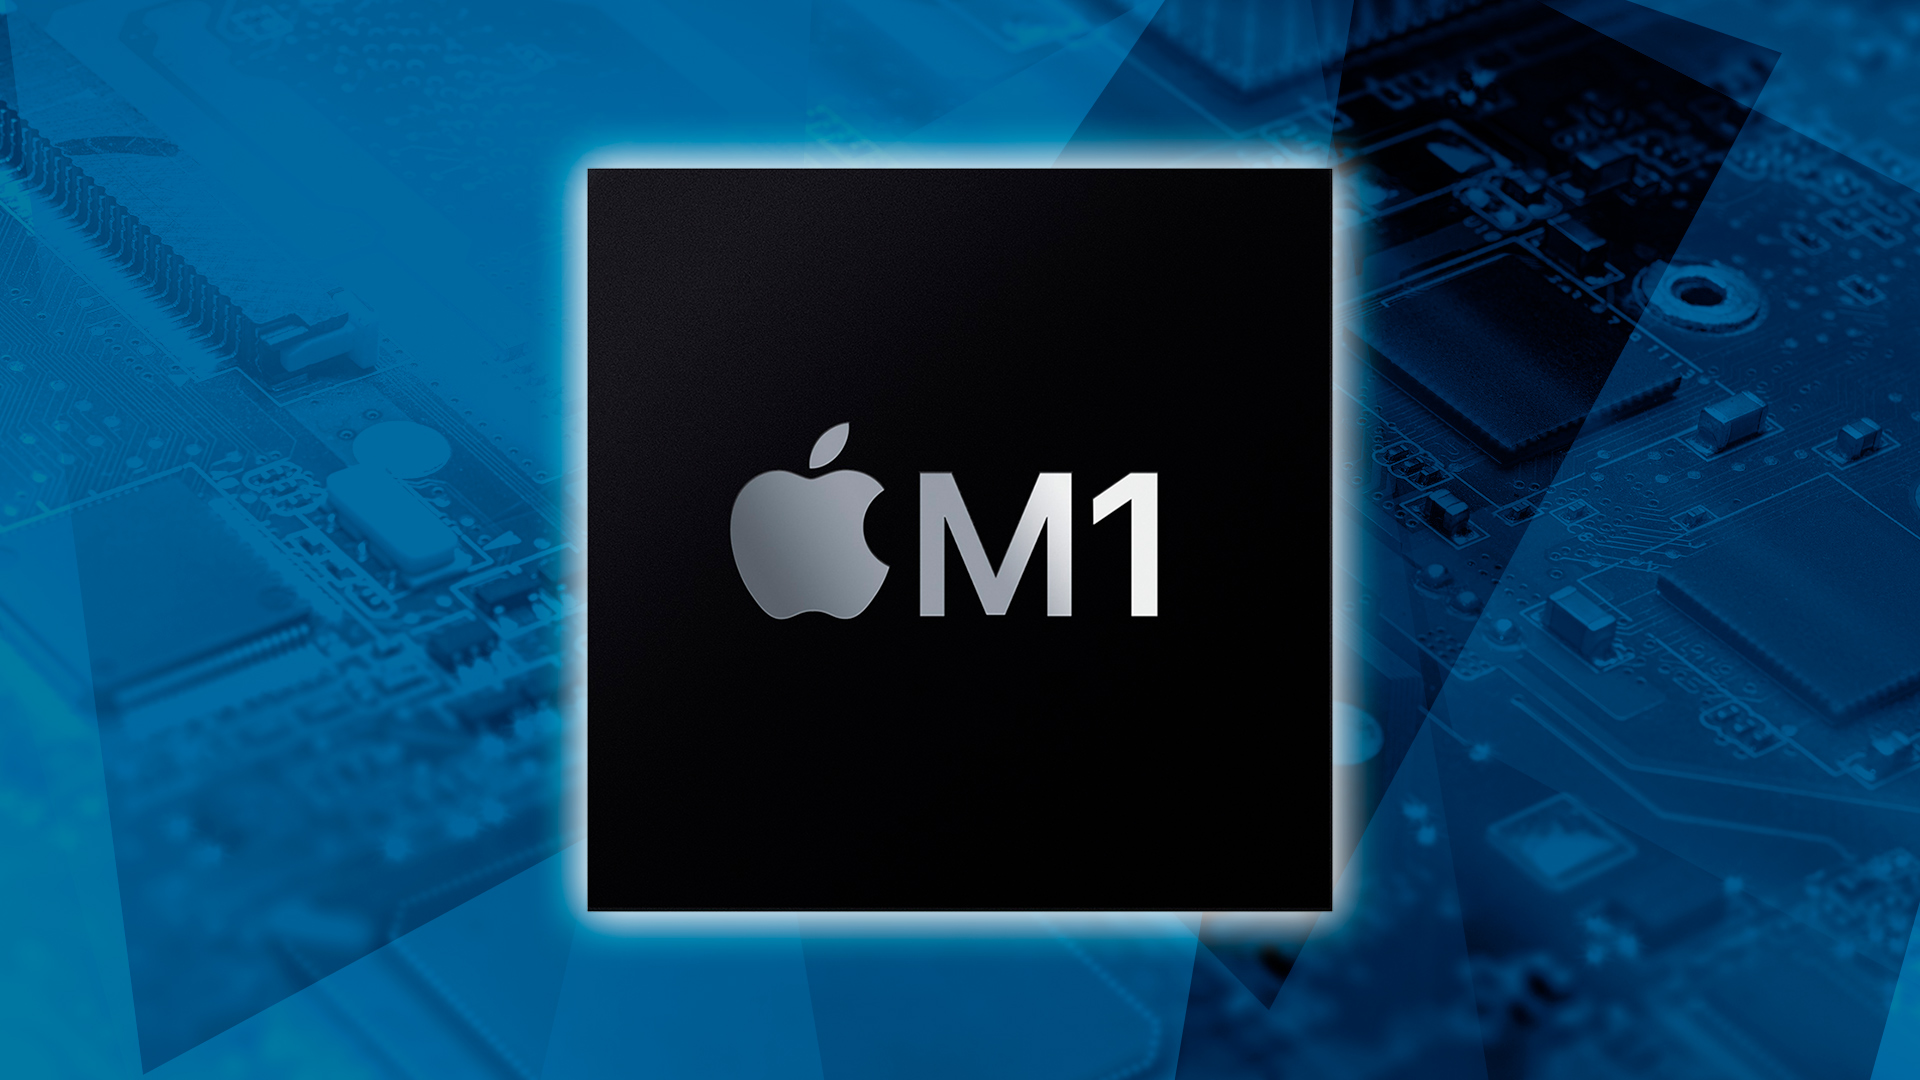 Apple, Prozessor, Logo, Cpu, Chip, SoC, Arm, Prozessoren, Chips, Apple M1, M1, Apple Logo, Apple Chip, Apple M1 Chip, M1 Chip, M1 Arm, Apple ARM, Arm Chip, Apple Arm Chip, M1 CPU, M1 Prozessor